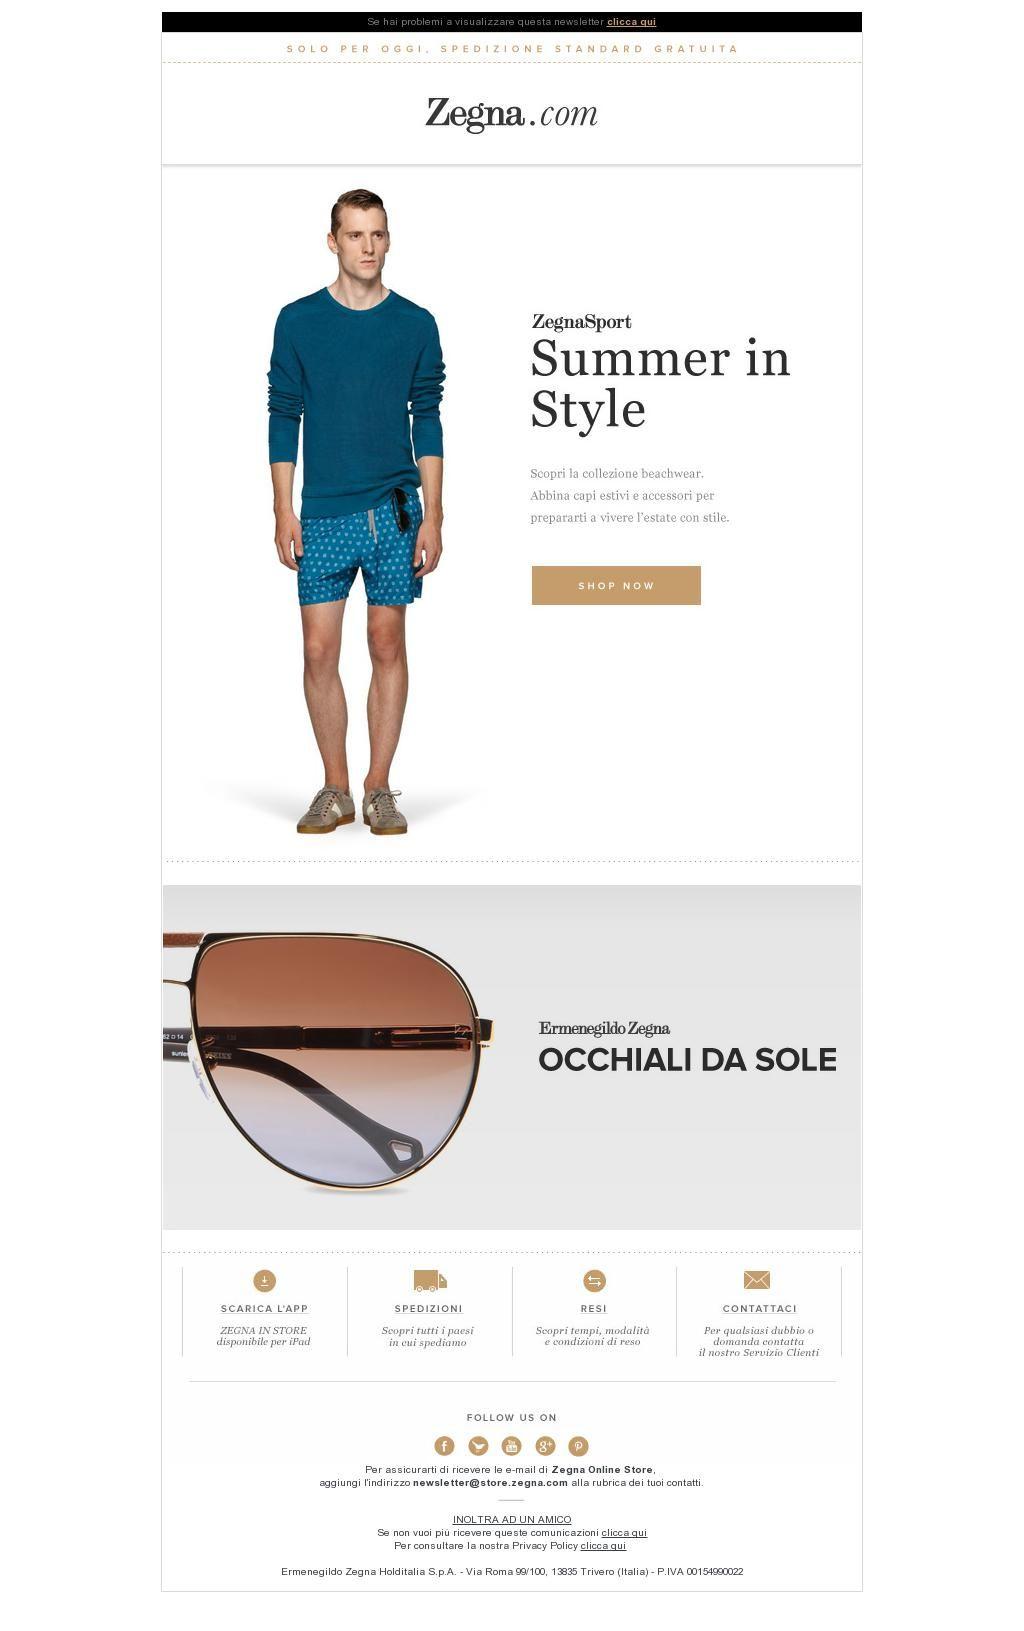 Zegna Sport: Summer Must-Haves & Spedizione Gratuita